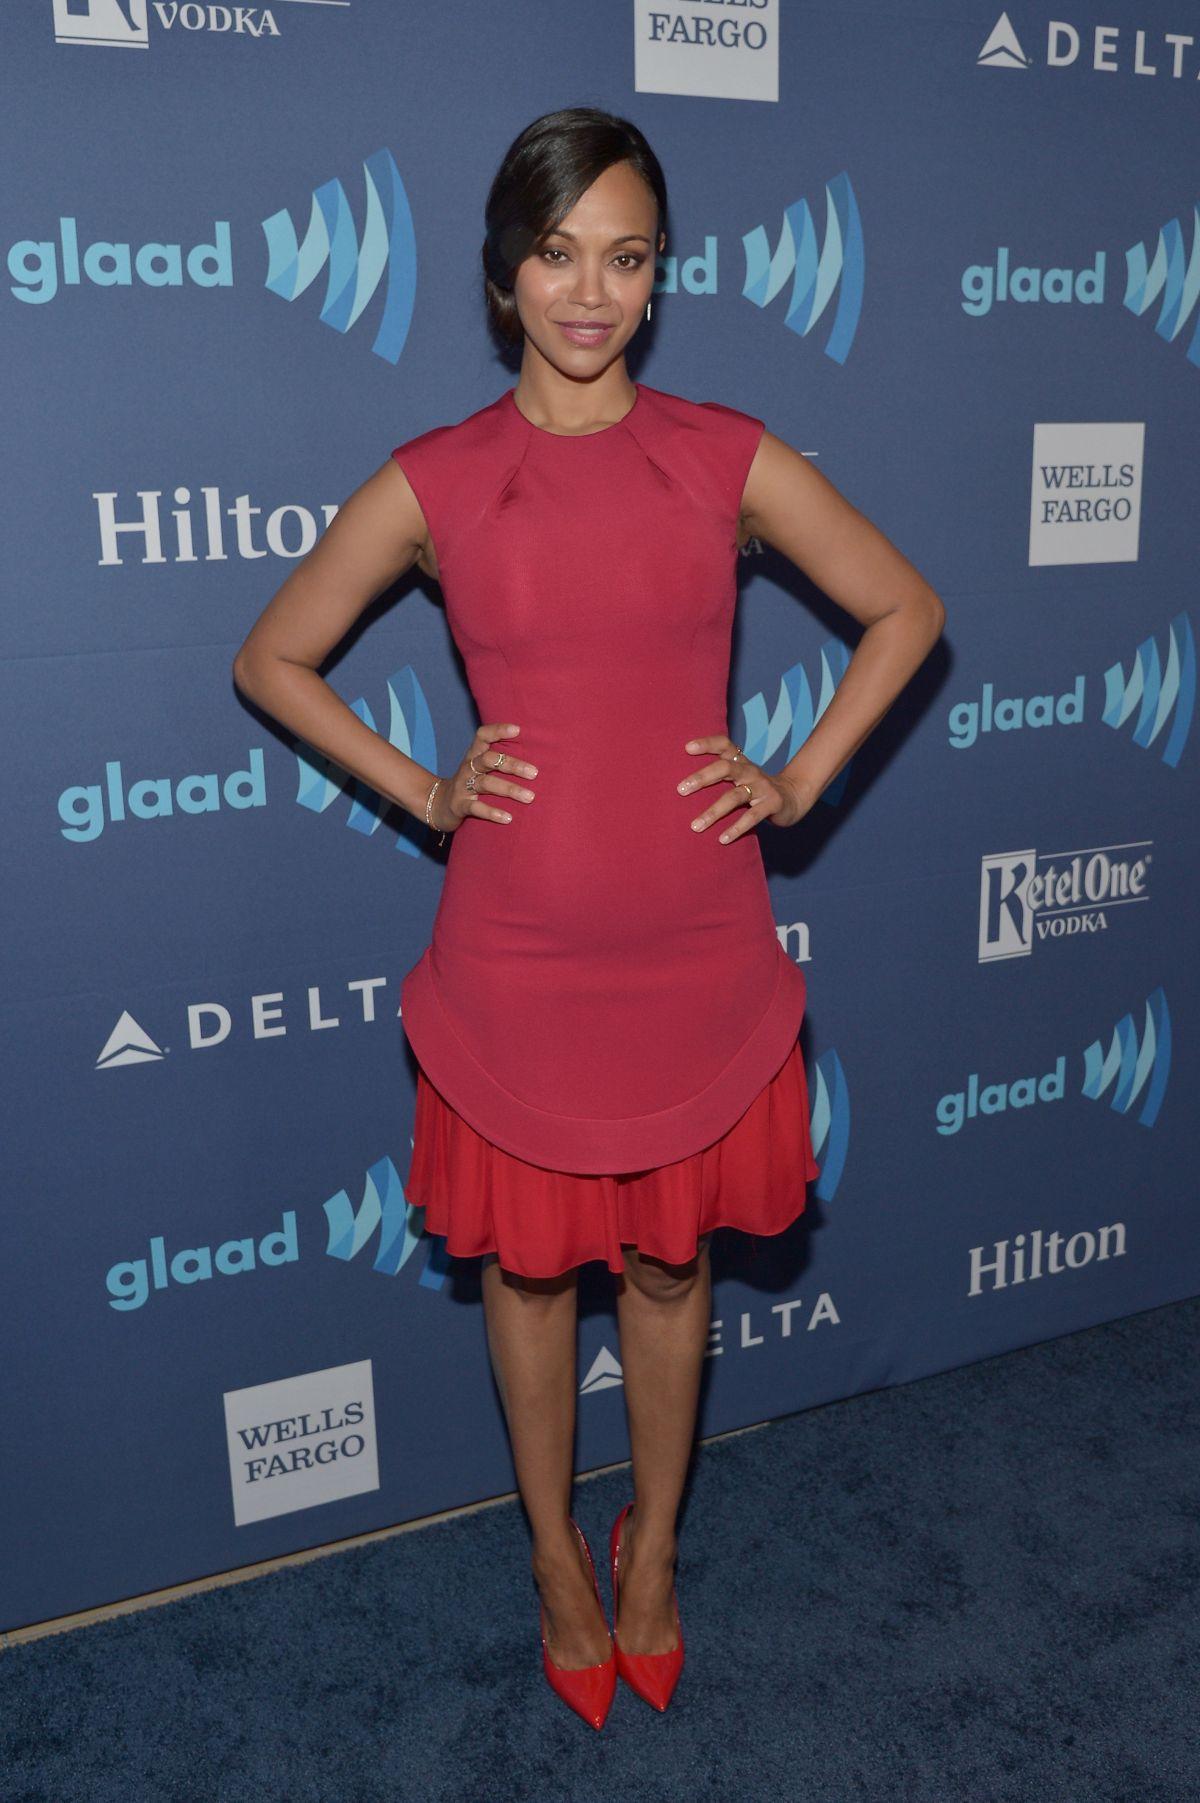 ZOE SALDANA at 2015 Glaad Media Awards in Beverly Hills ...